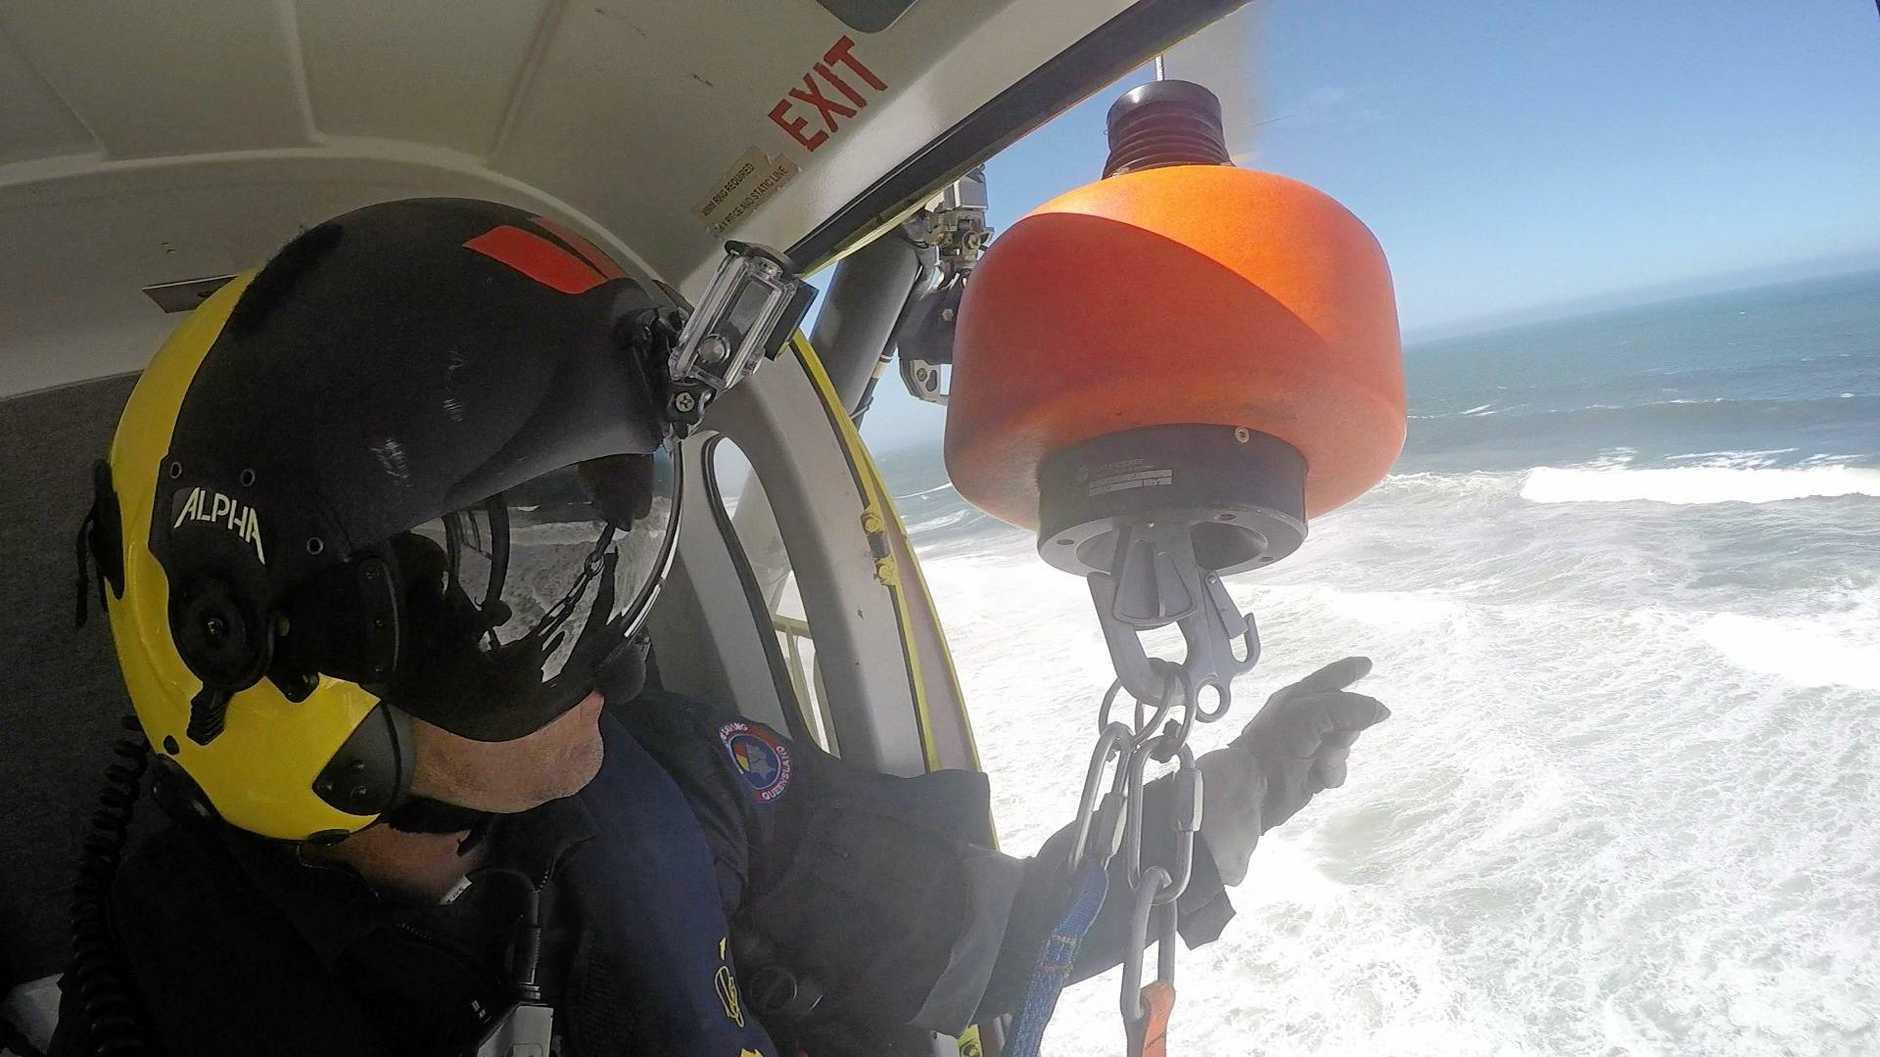 Richard McHugh on a mission with Lifeflight.